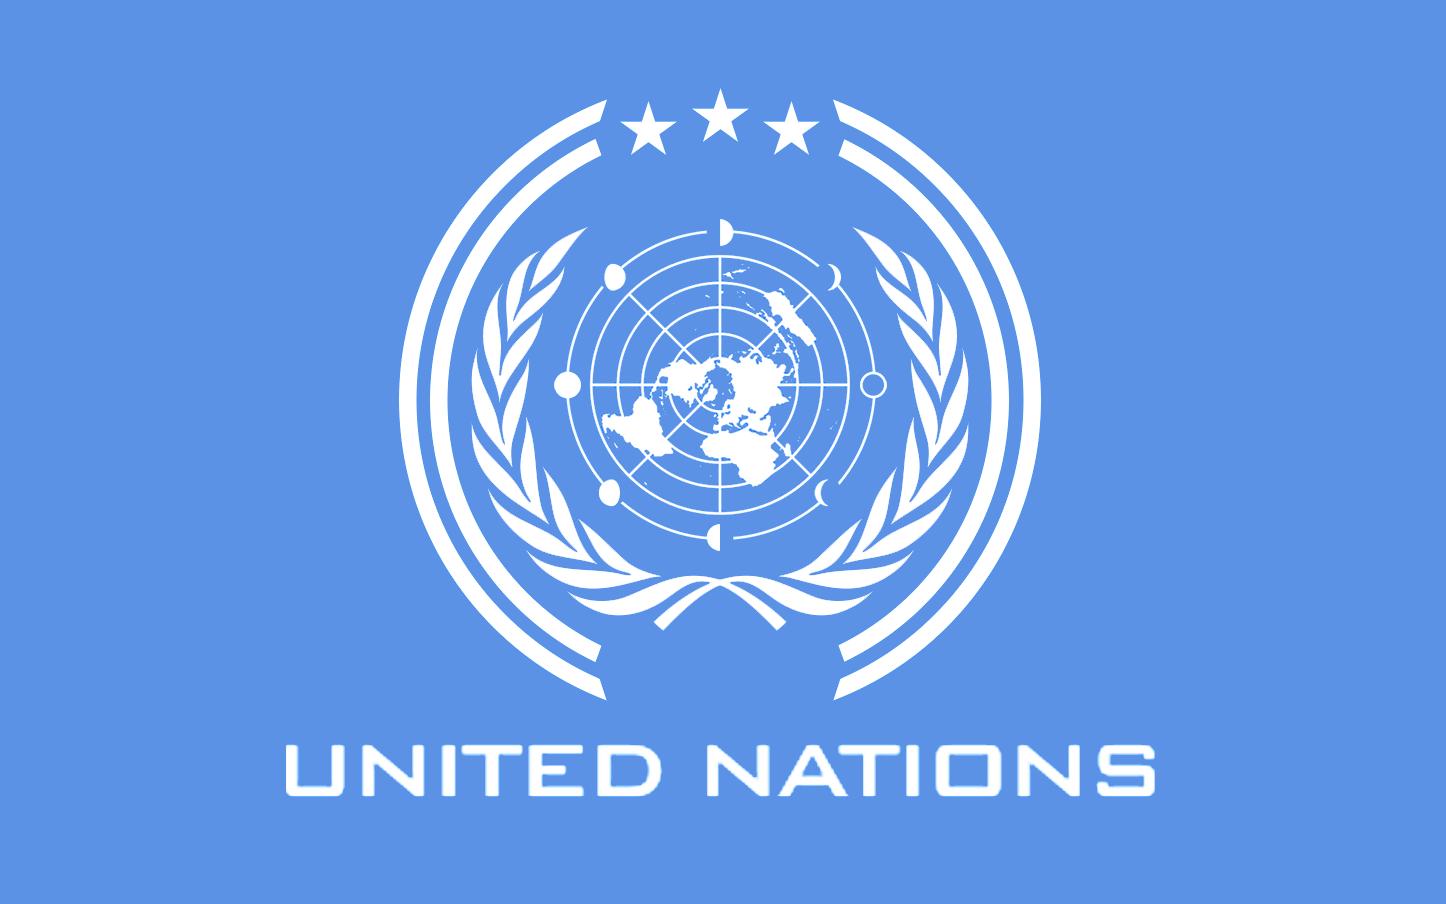 FinMin Joint Secretary Rashmi R Das appointed to UN Tax Committee | రస్మి రంజన్ దాస్ UN టాక్స్ కమిటీ సభ్యుడిగా నియమితులయ్యారు |_40.1